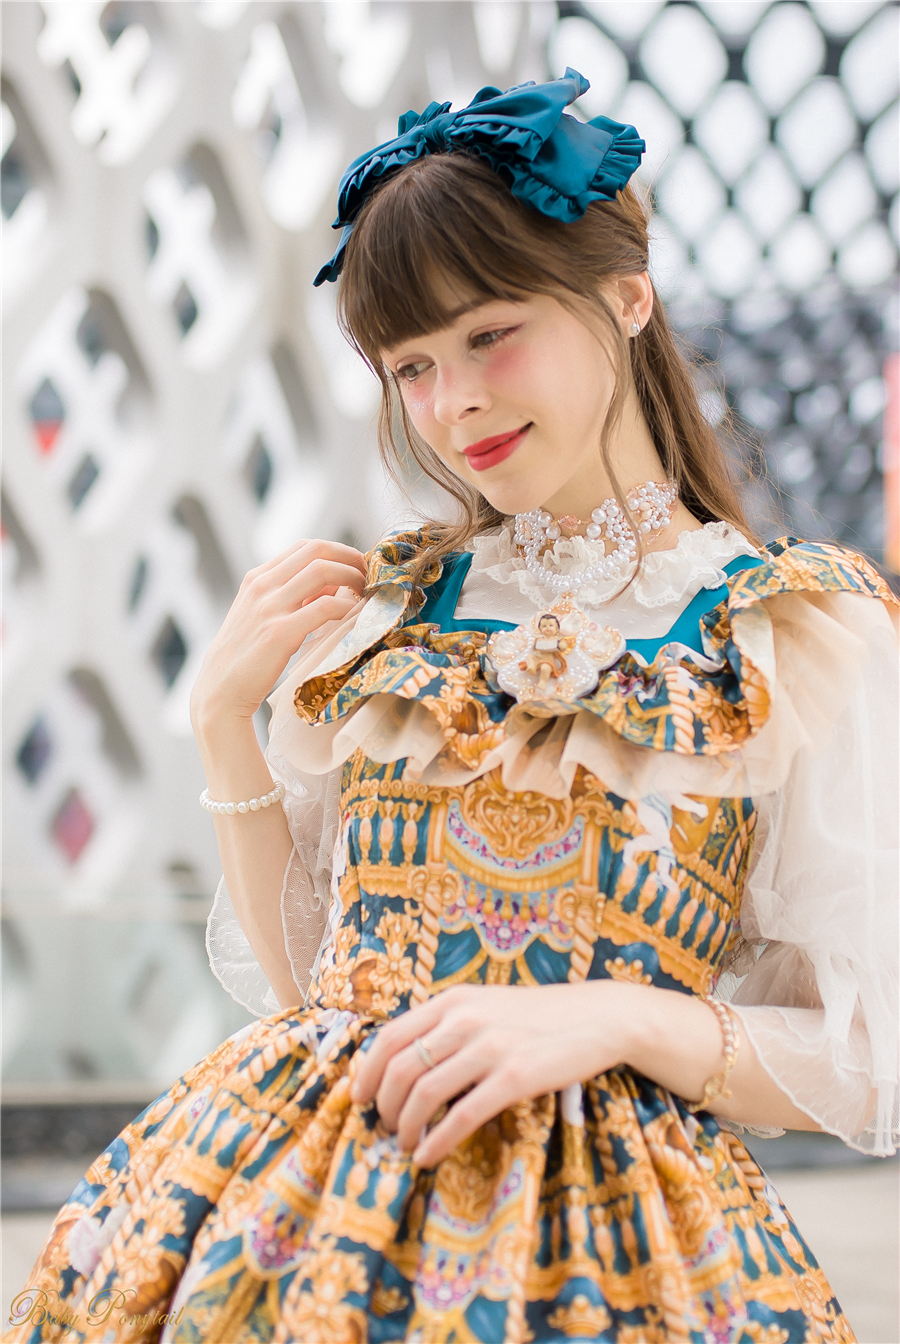 Babyponytail_Model_Ruffle Collar JSK_Tiel Angel_2_Claudia_4.jpg